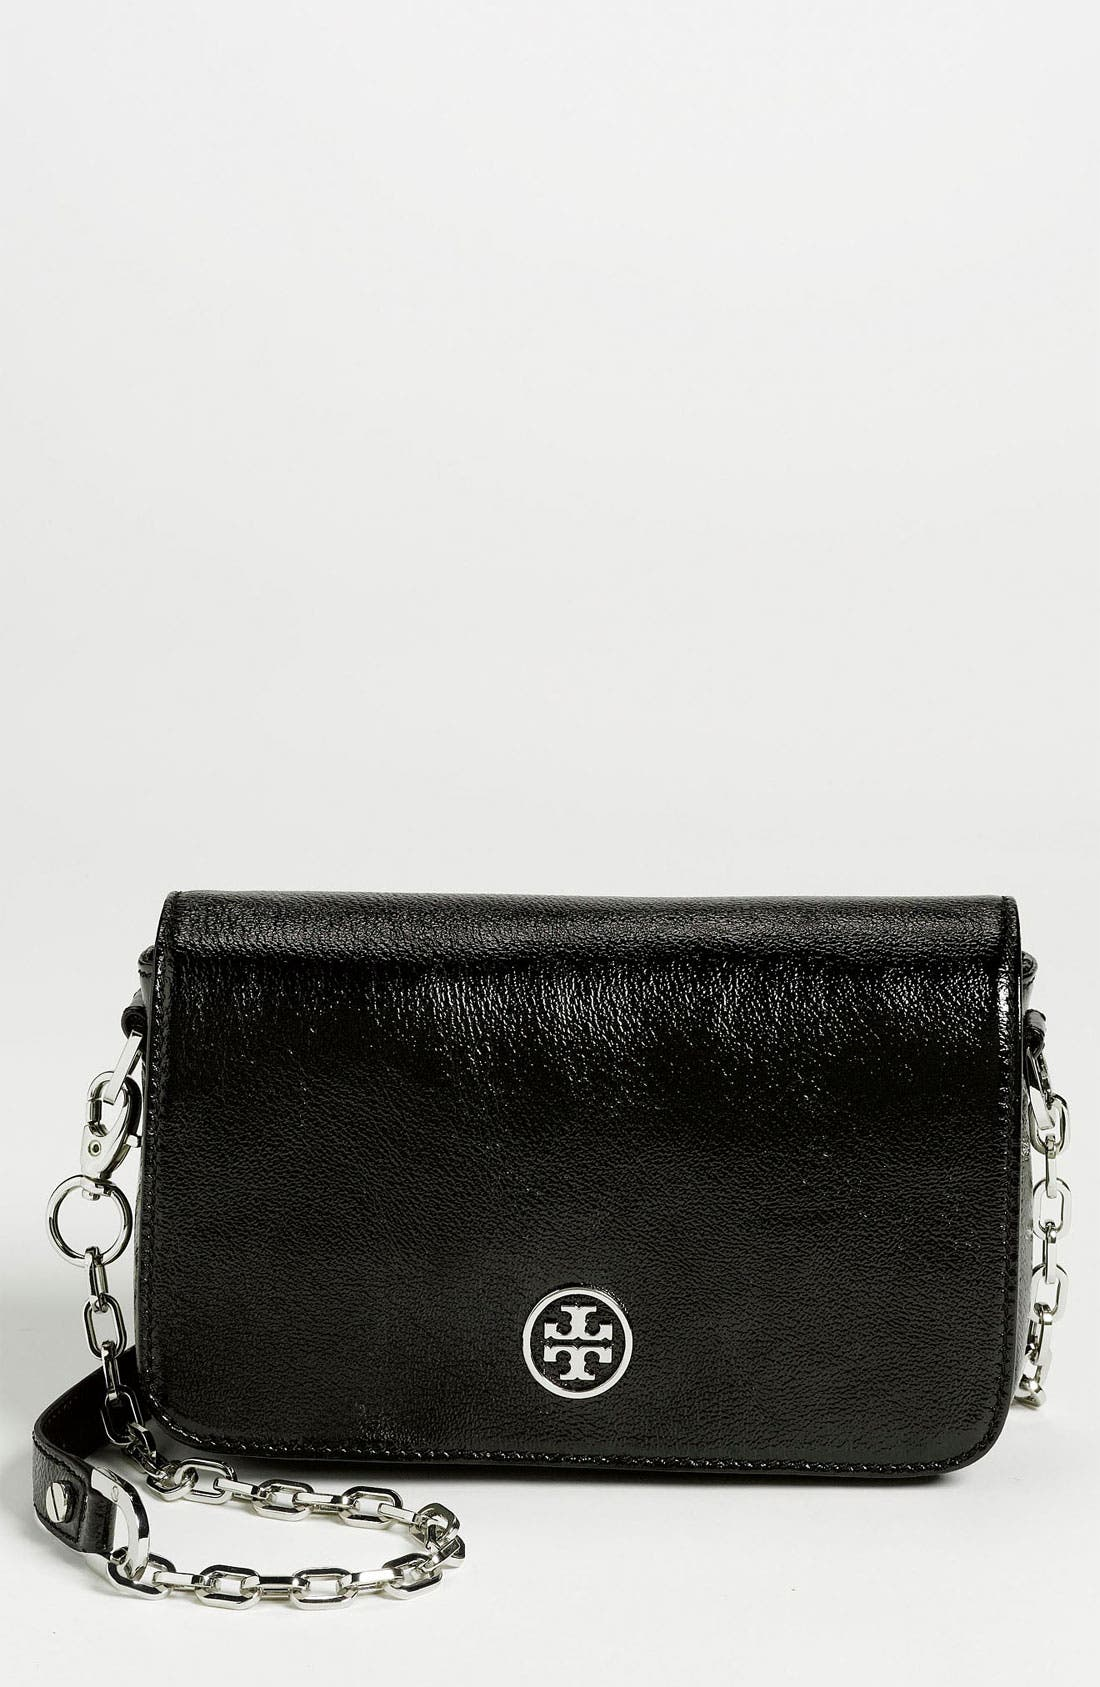 Alternate Image 1 Selected - Tory Burch 'Robinson - Mini' Adjustable Crossbody Bag